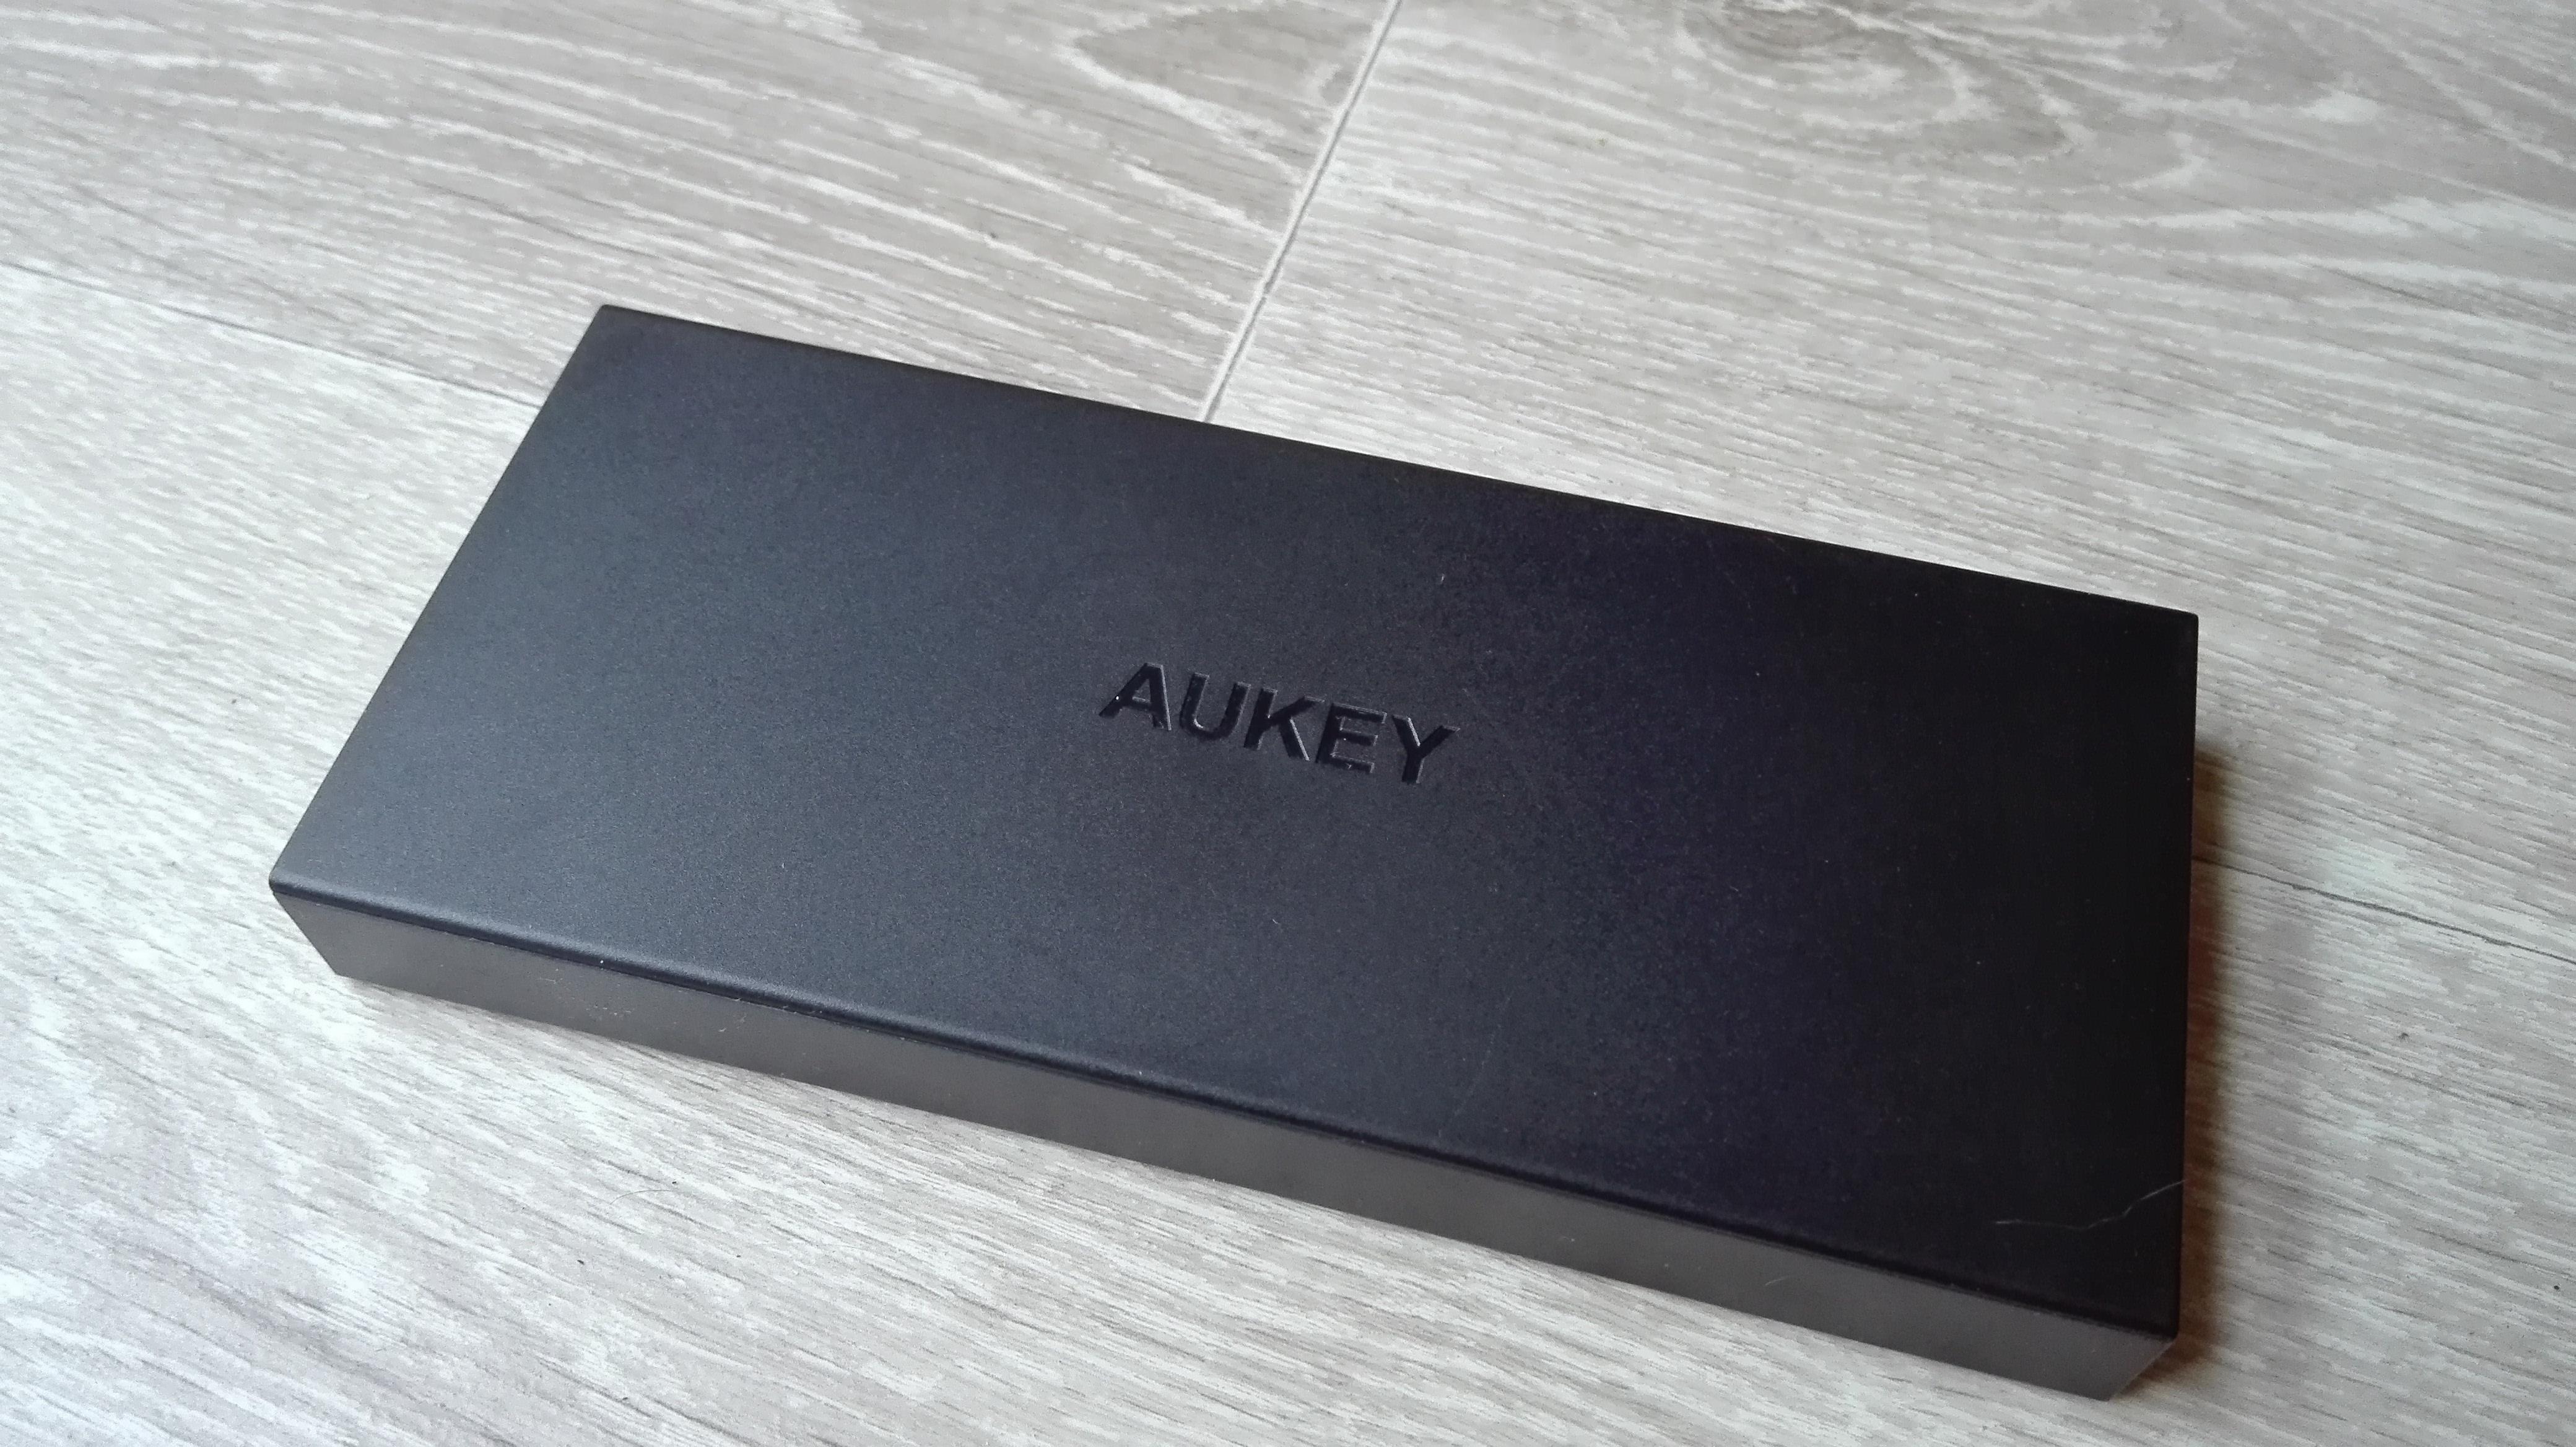 test Batterie Aukey 16000 mAh review KEY 16000MAH QUICKCHARGE